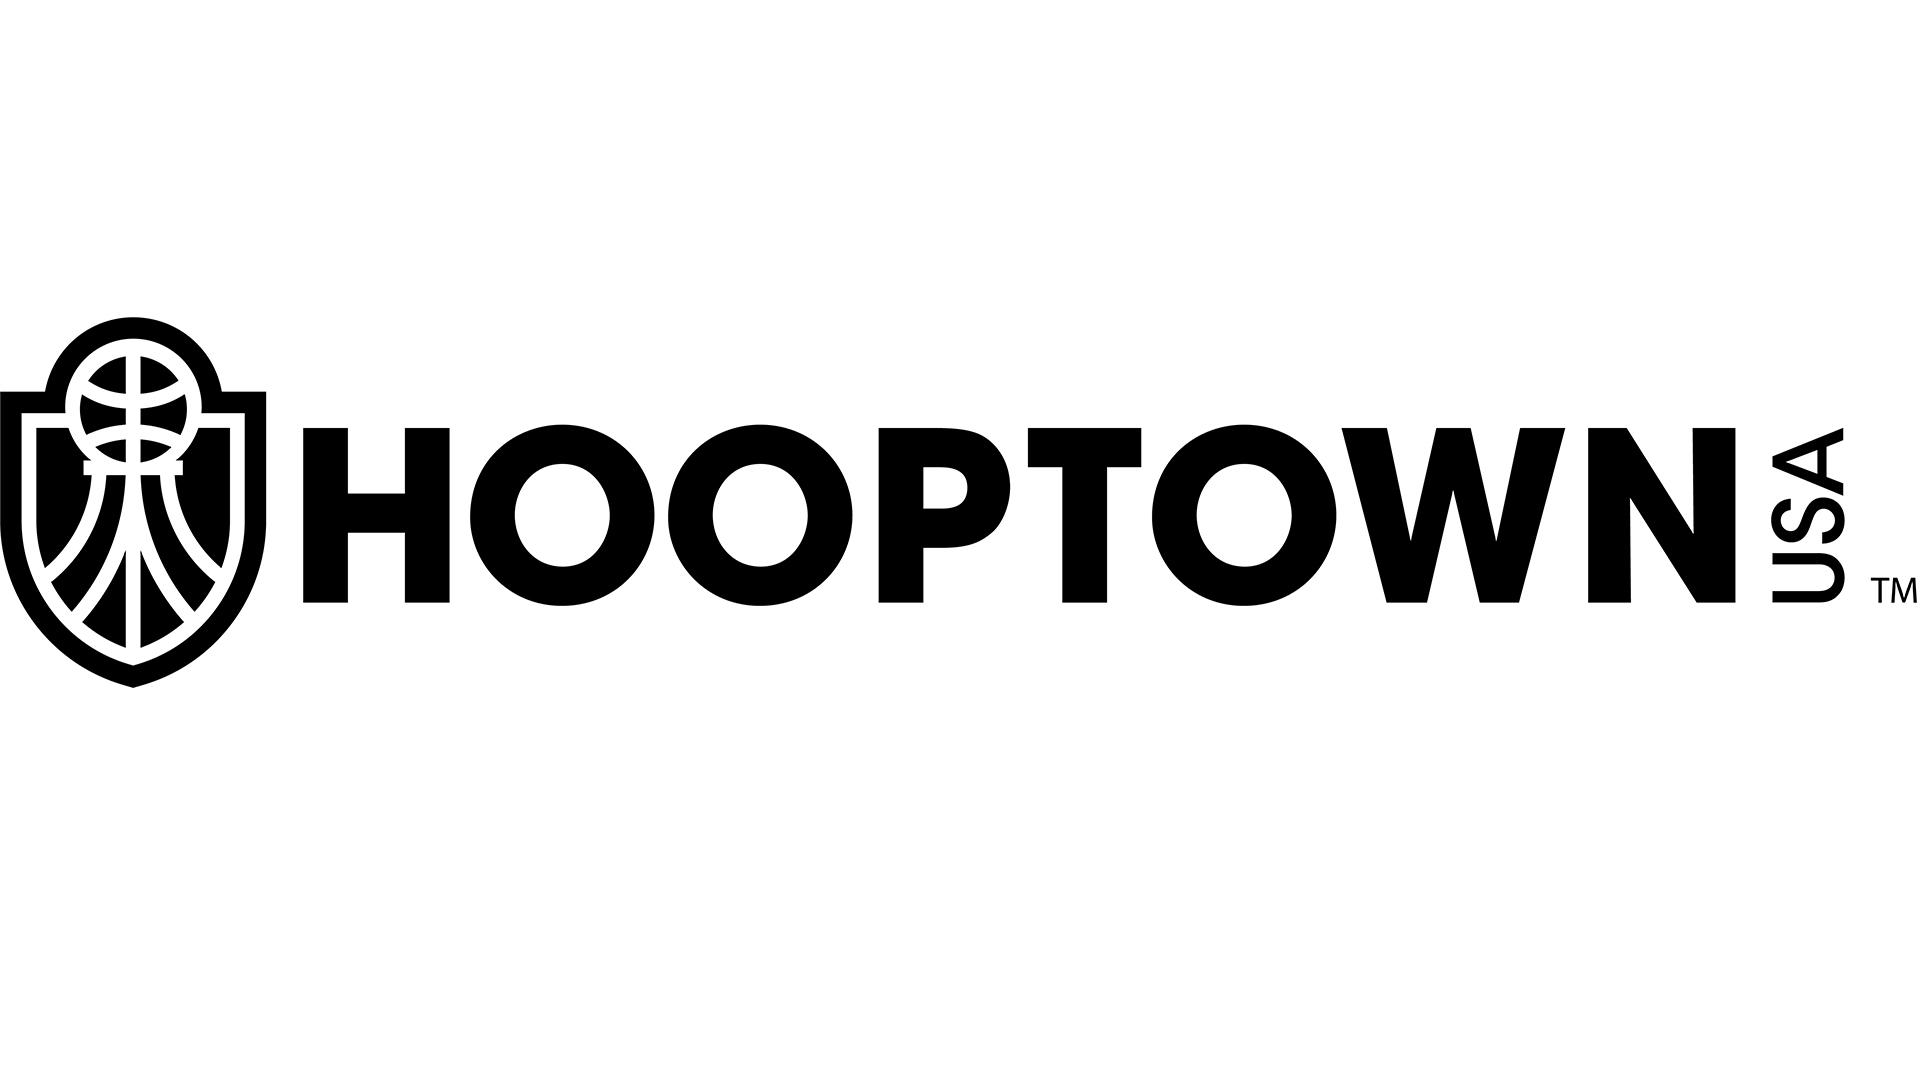 https://www.hubsportscenter.org/wp-content/uploads/2012/07/hooptown-usa_1561384991489-jpg_38778465_ver1-0.jpg